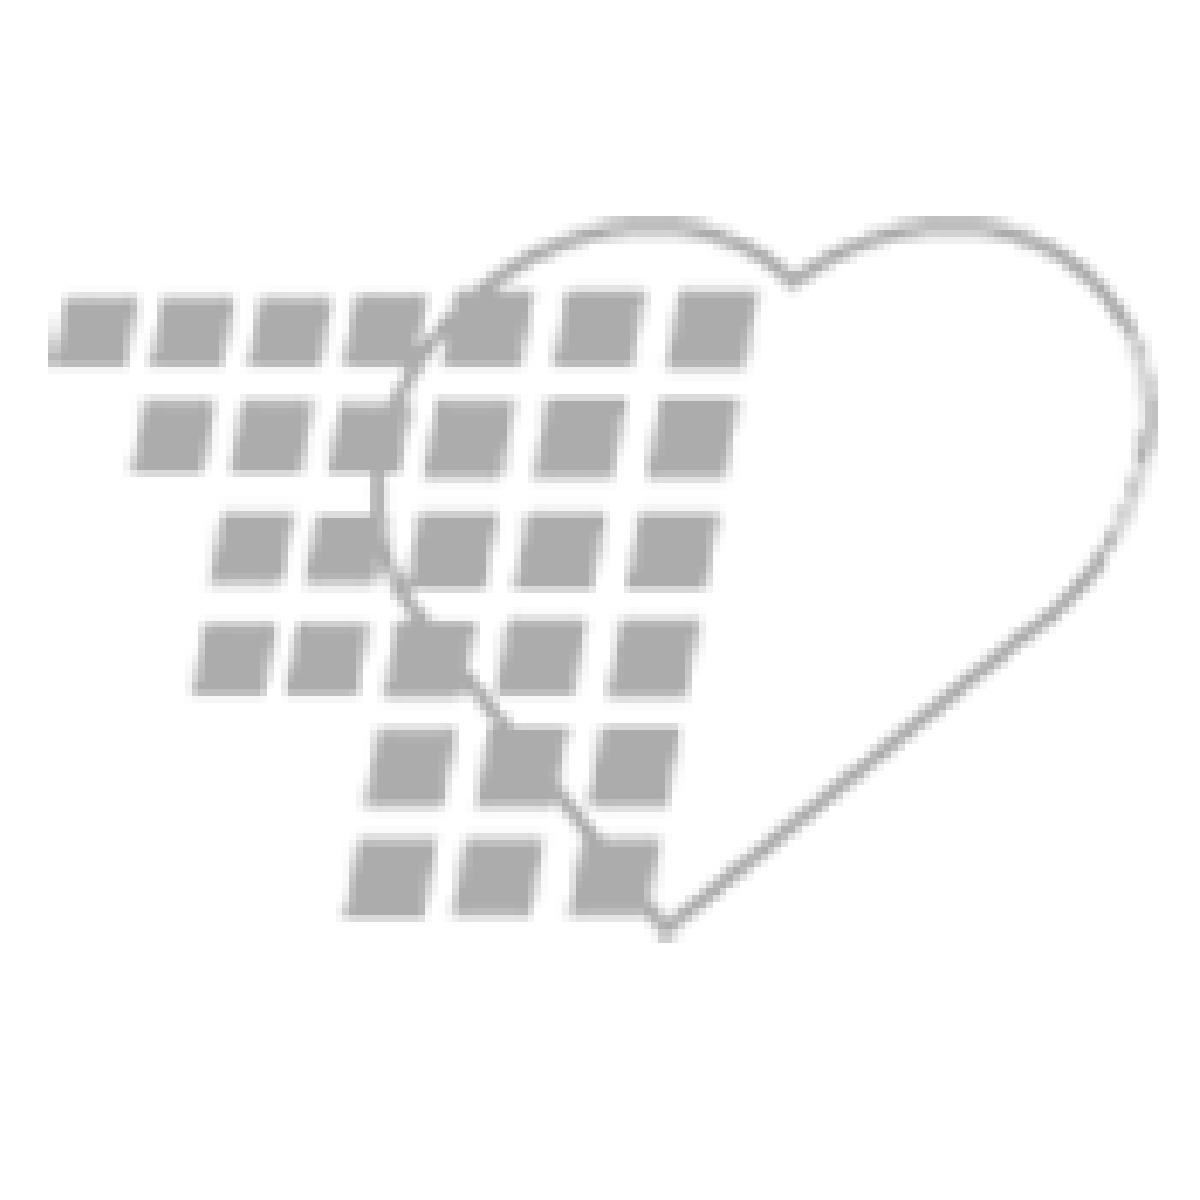 02-27-2400 - Duracell® Procell® Alkaline Battery - AAA